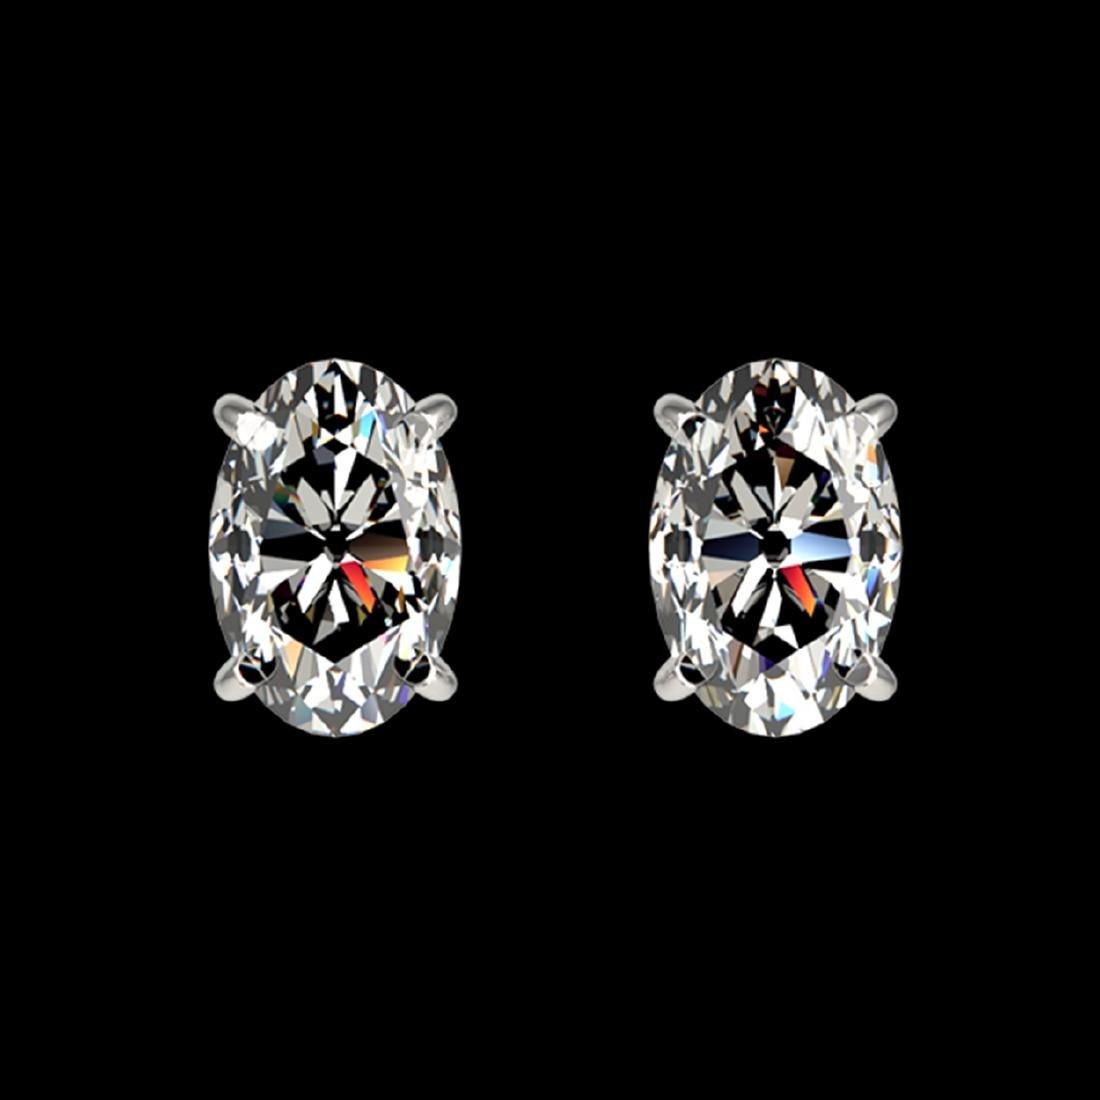 1 CTW VS/SI Quality Oval Diamond Stud Earrings Gold -